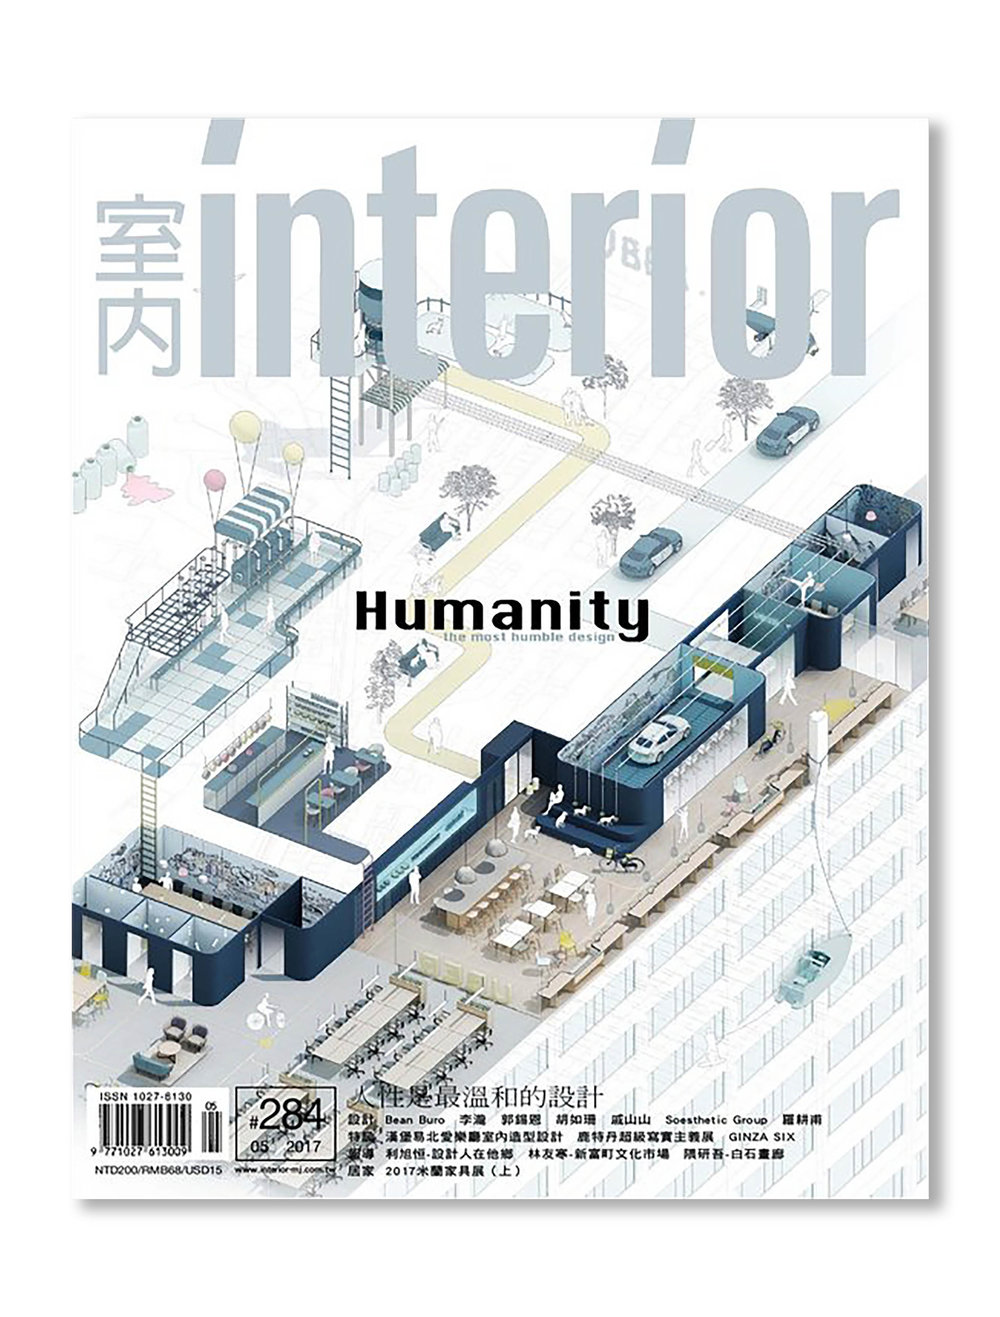 Bean Buro_Interior Taiwan Magazine_May 17_Cover.jpg